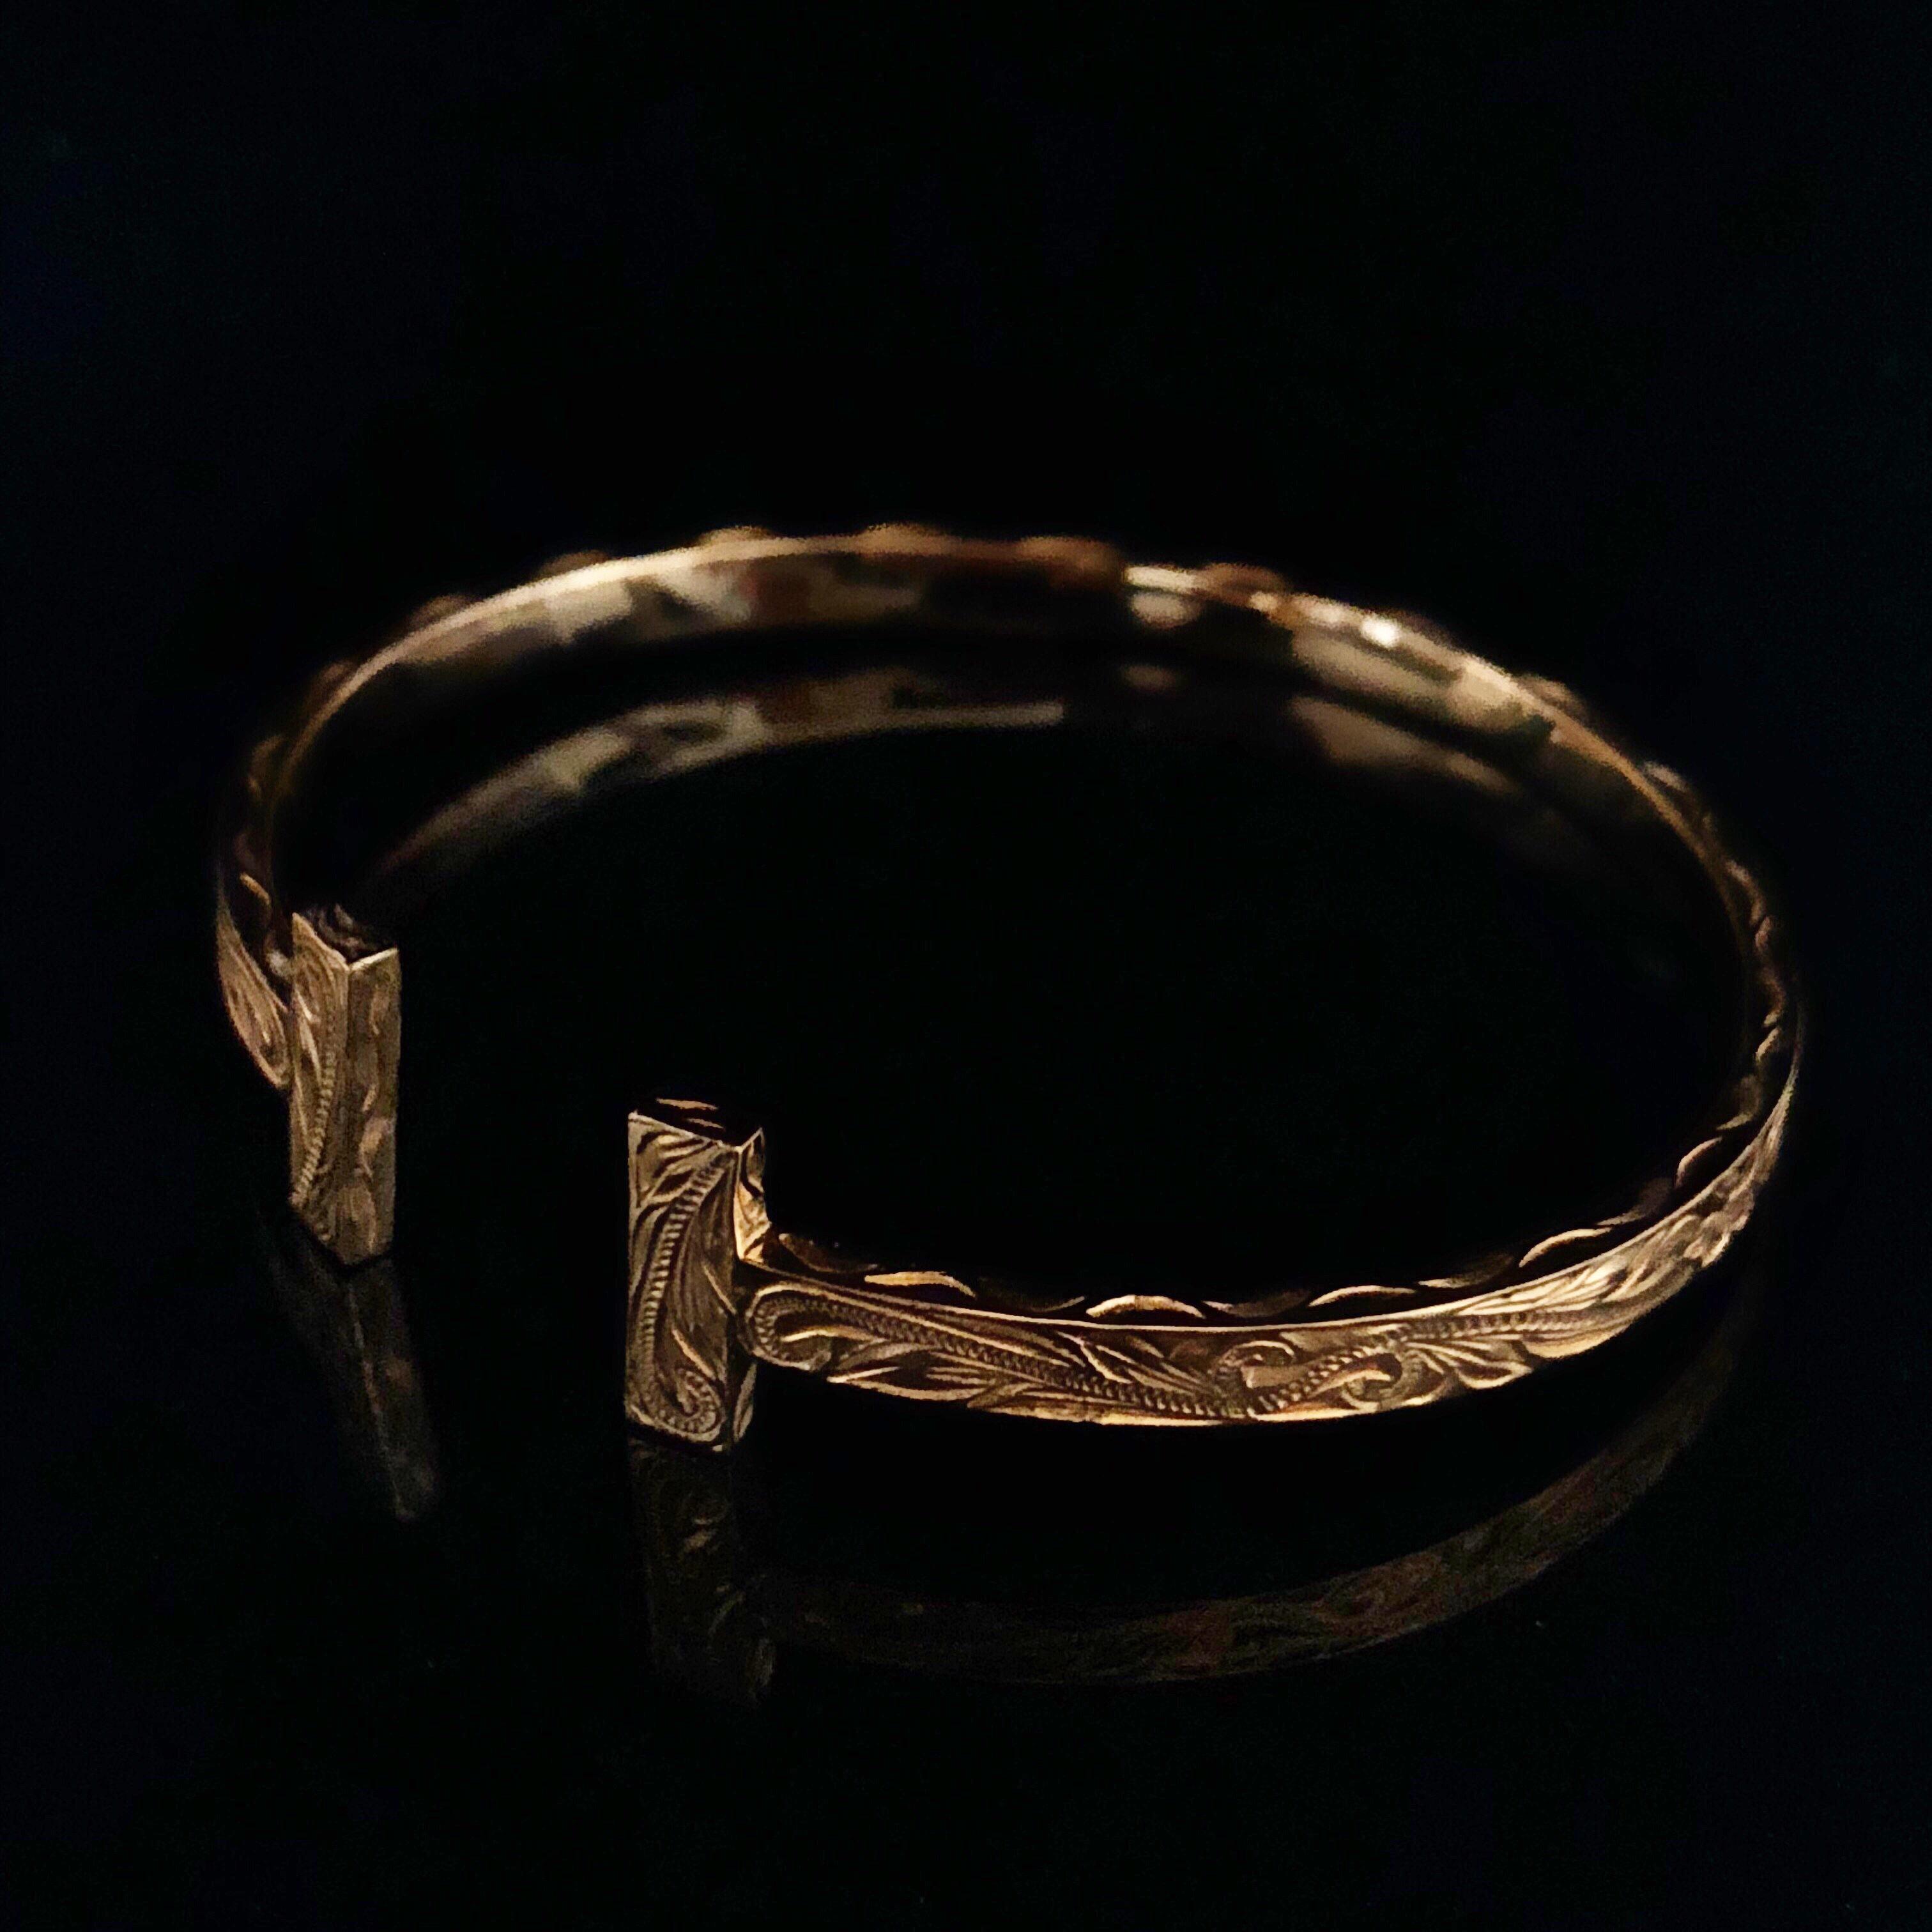 24kgp Hawaiian jewelry bangle(Tsquare)